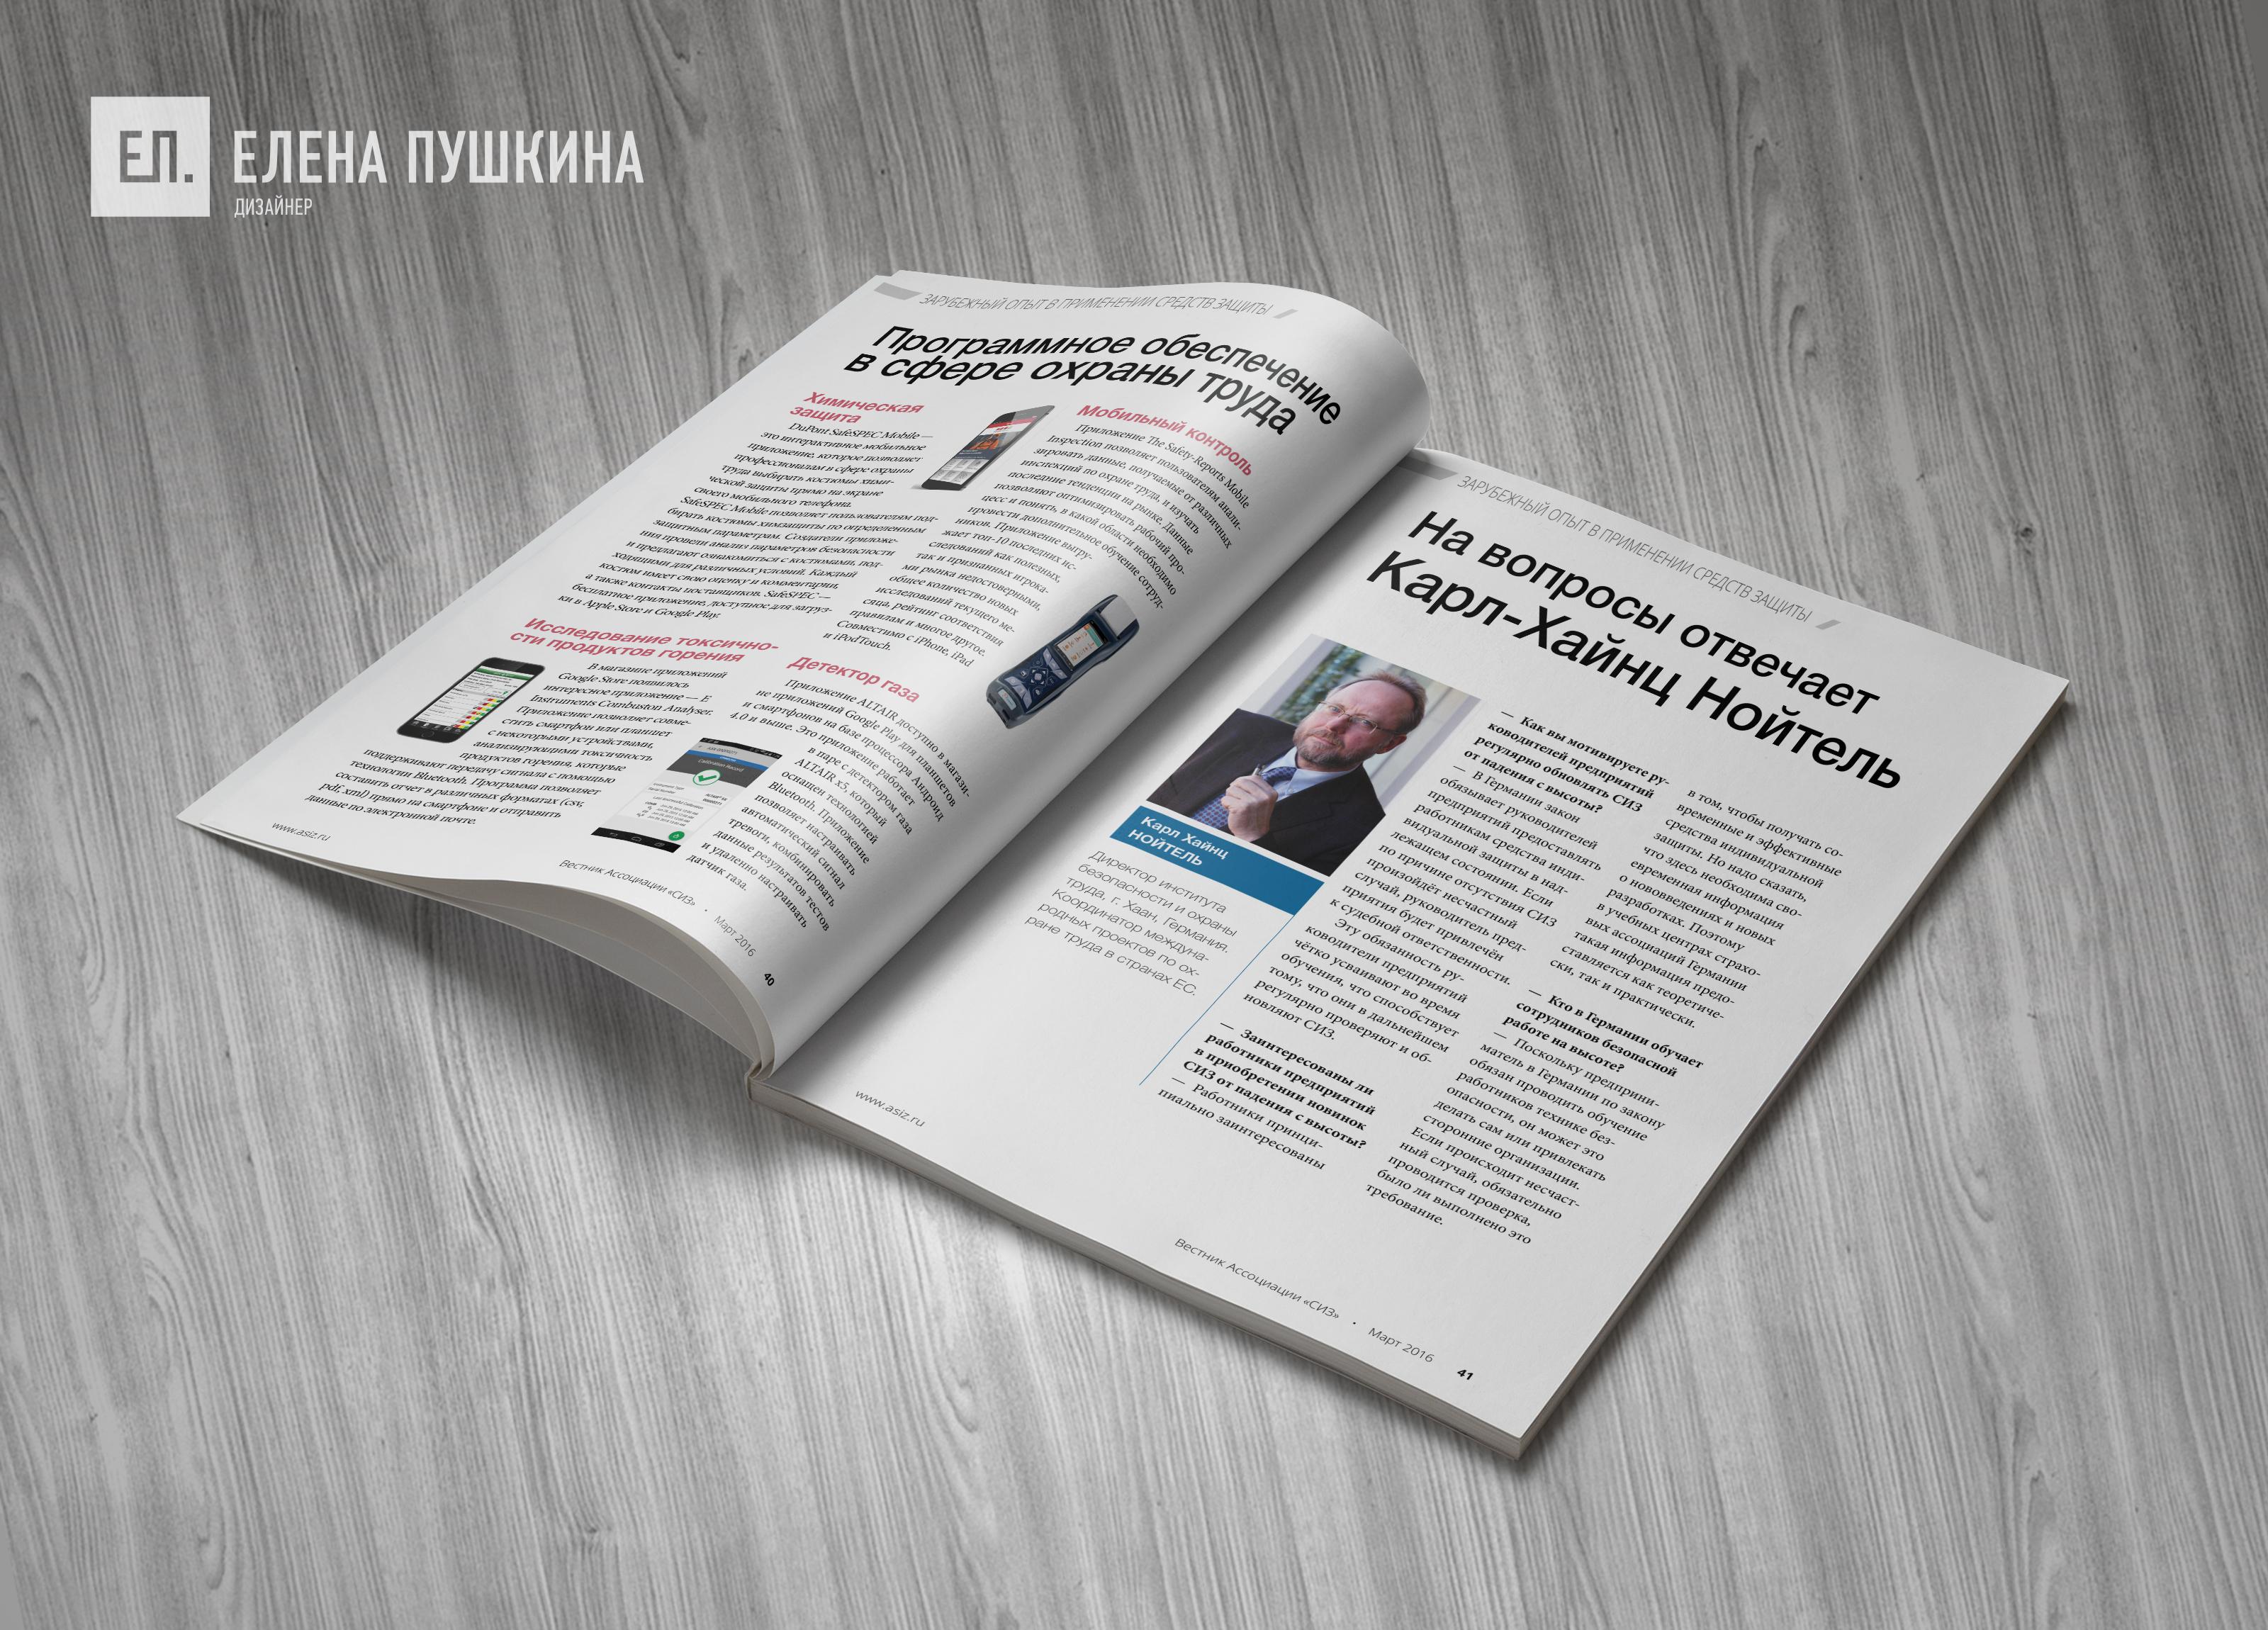 Журнал «Вестник Ассоциации СИЗ»— разработка с«нуля» логотипа, обложки, макета ивёрстка журнала Разработка журналов Портфолио